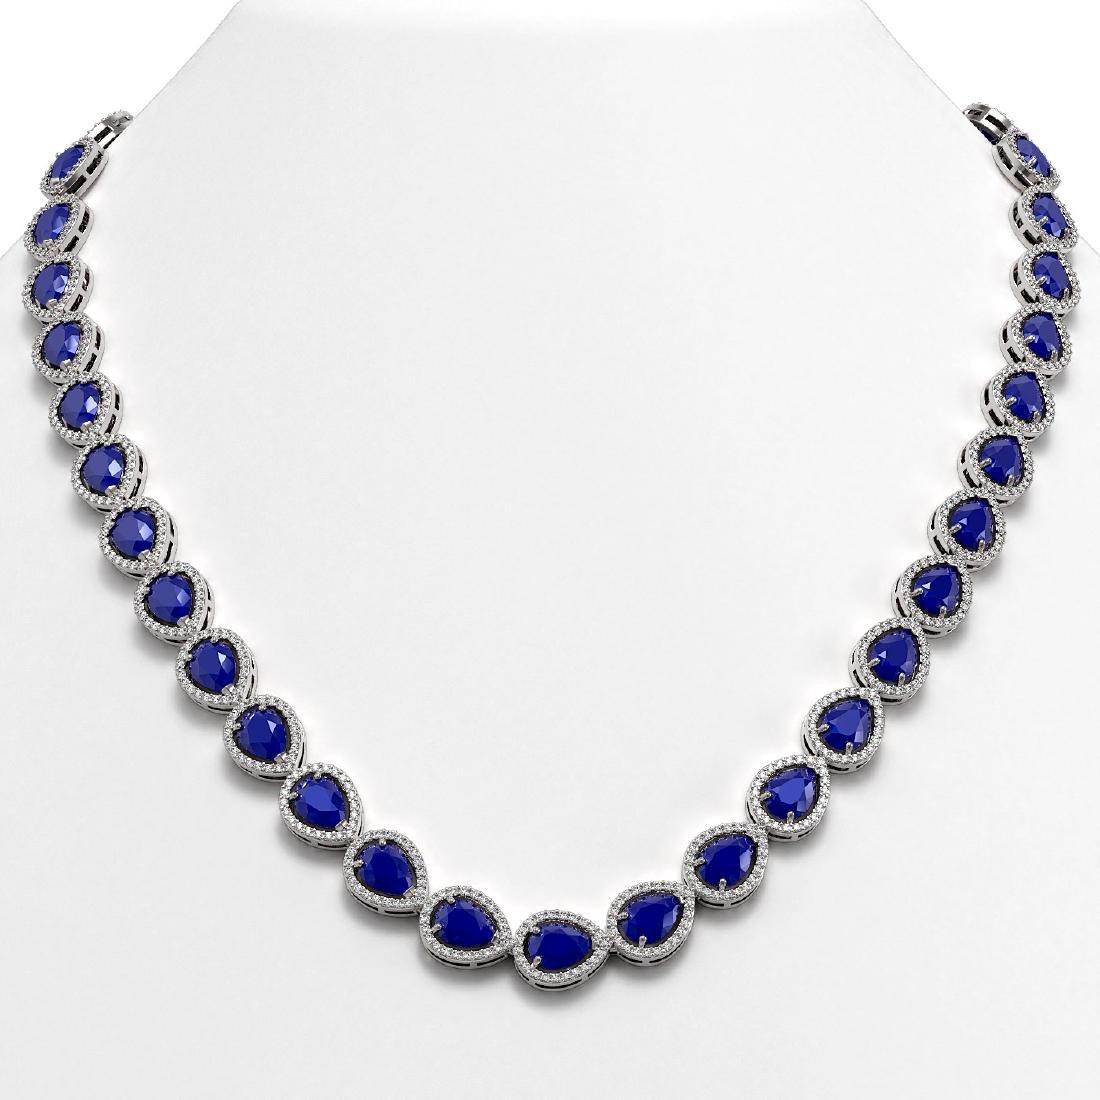 45.93 CTW Sapphire & Diamond Halo Necklace 10K White